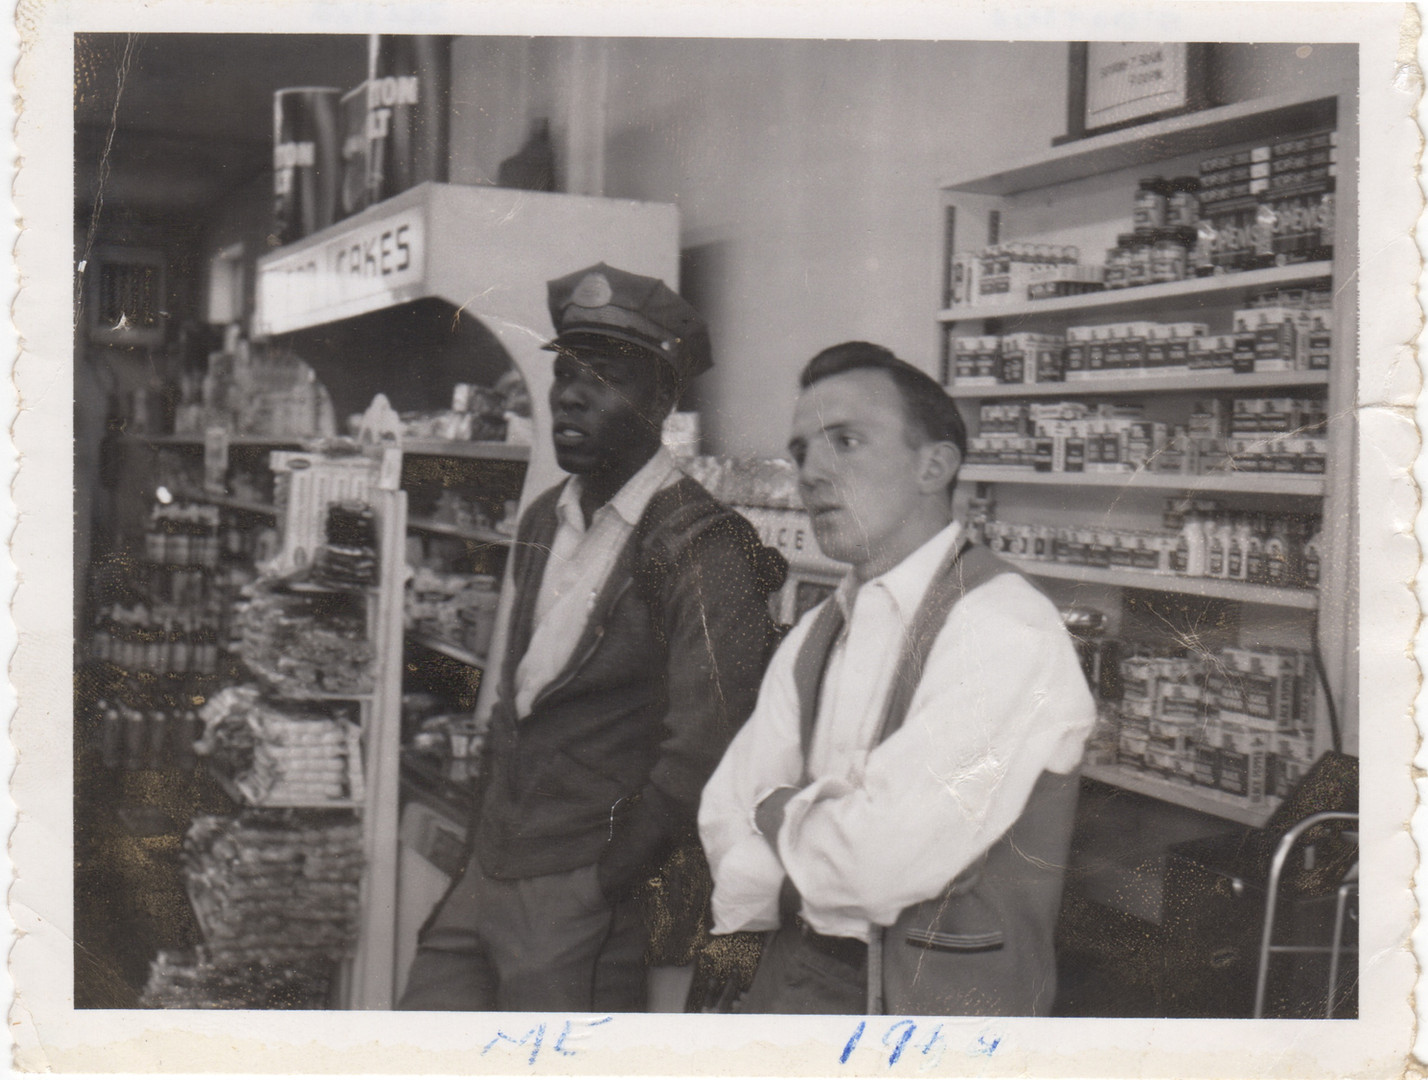 1959 in uniform.jpeg